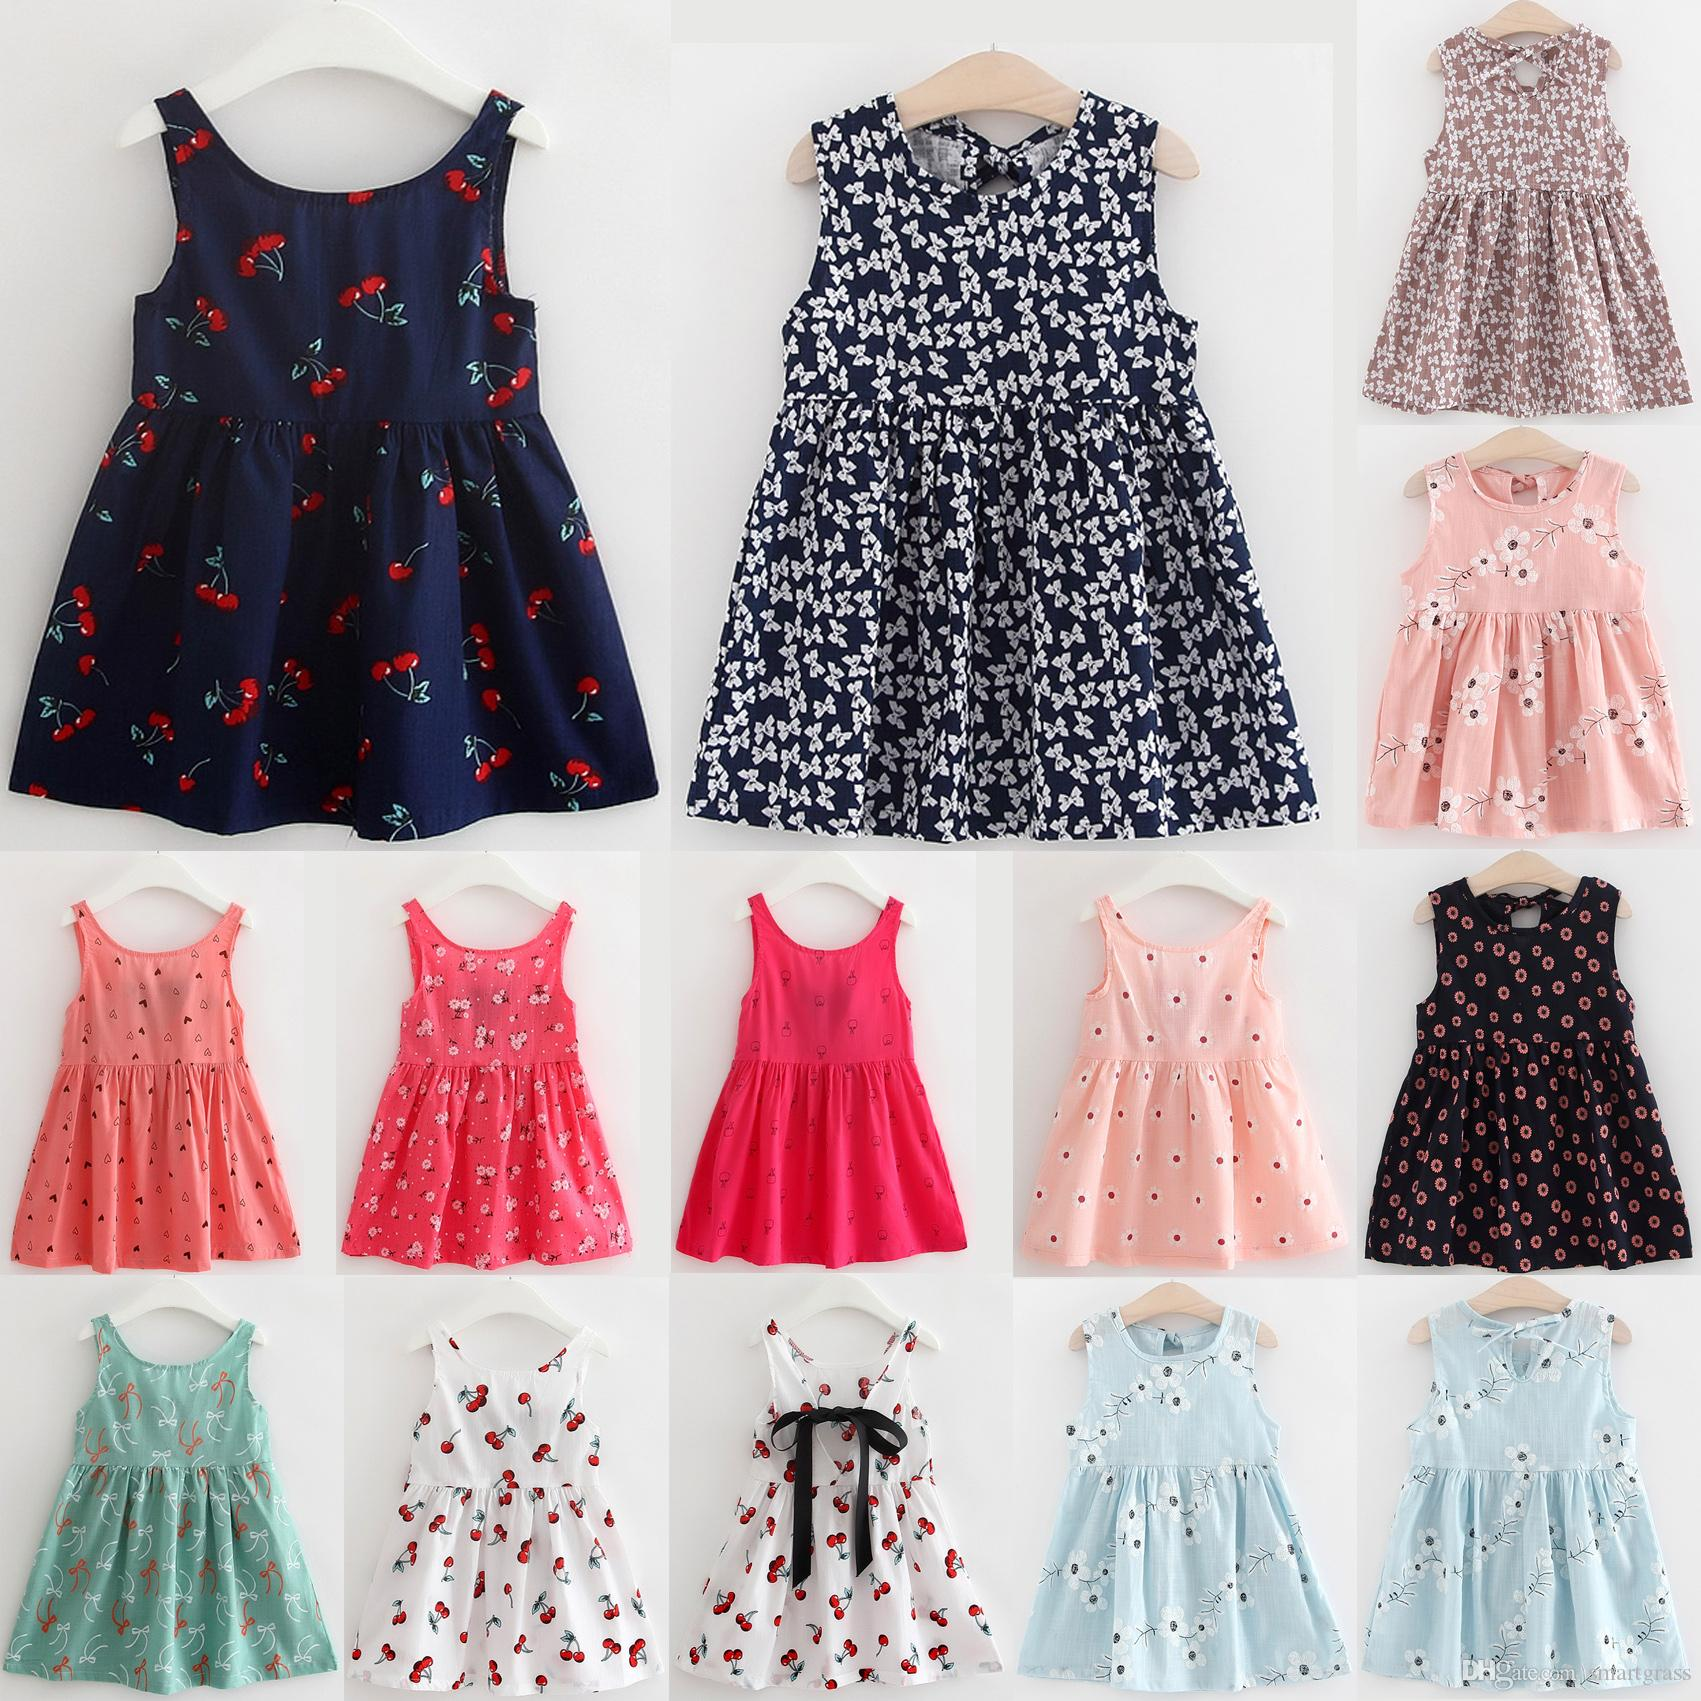 13 Patterns Girls Dresses Floral Baby Clothes Cotton Linen Flower